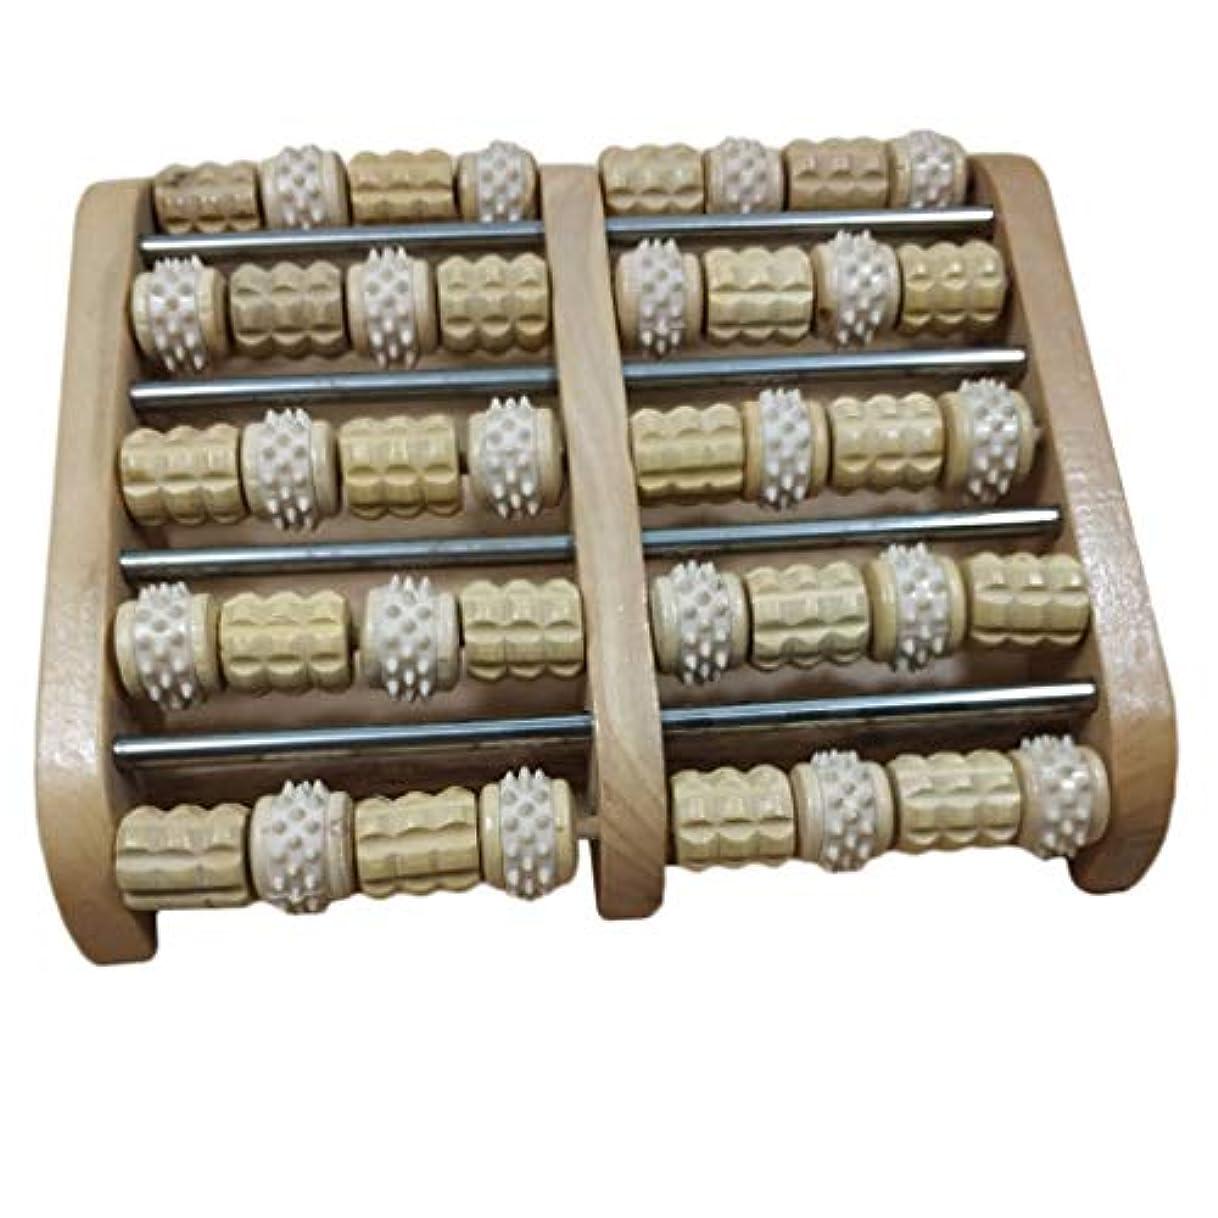 Baoblaze デュアルフットマッサージローラー 家庭用 サロン用 フットマッサージ 木製 高品質